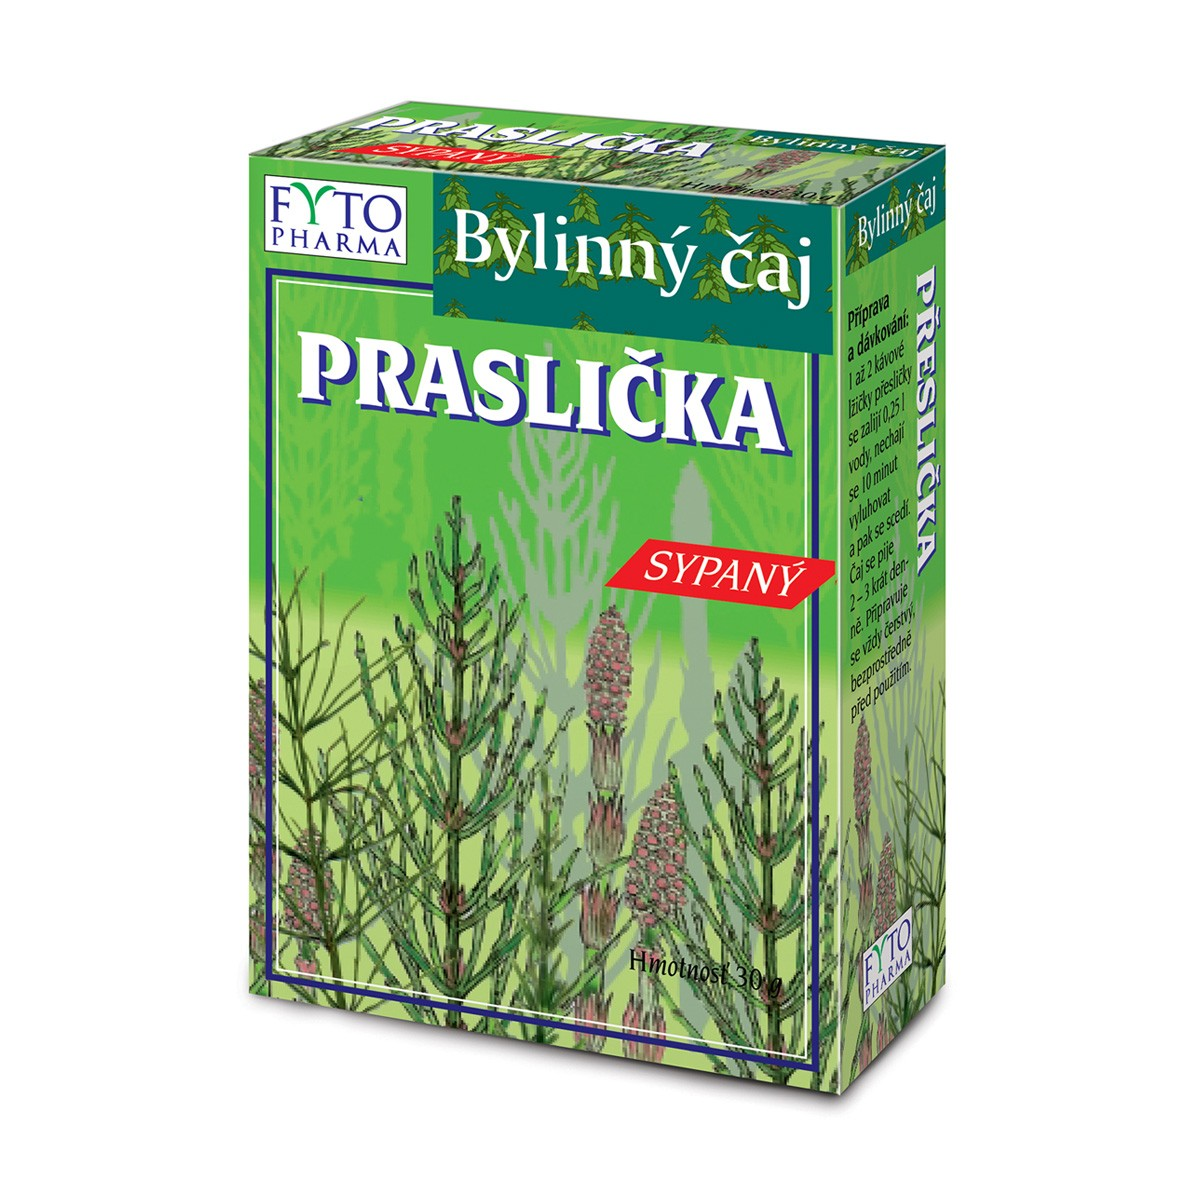 P�esli�kov� �aj bylinn� sypan� 30 g Fytopharma